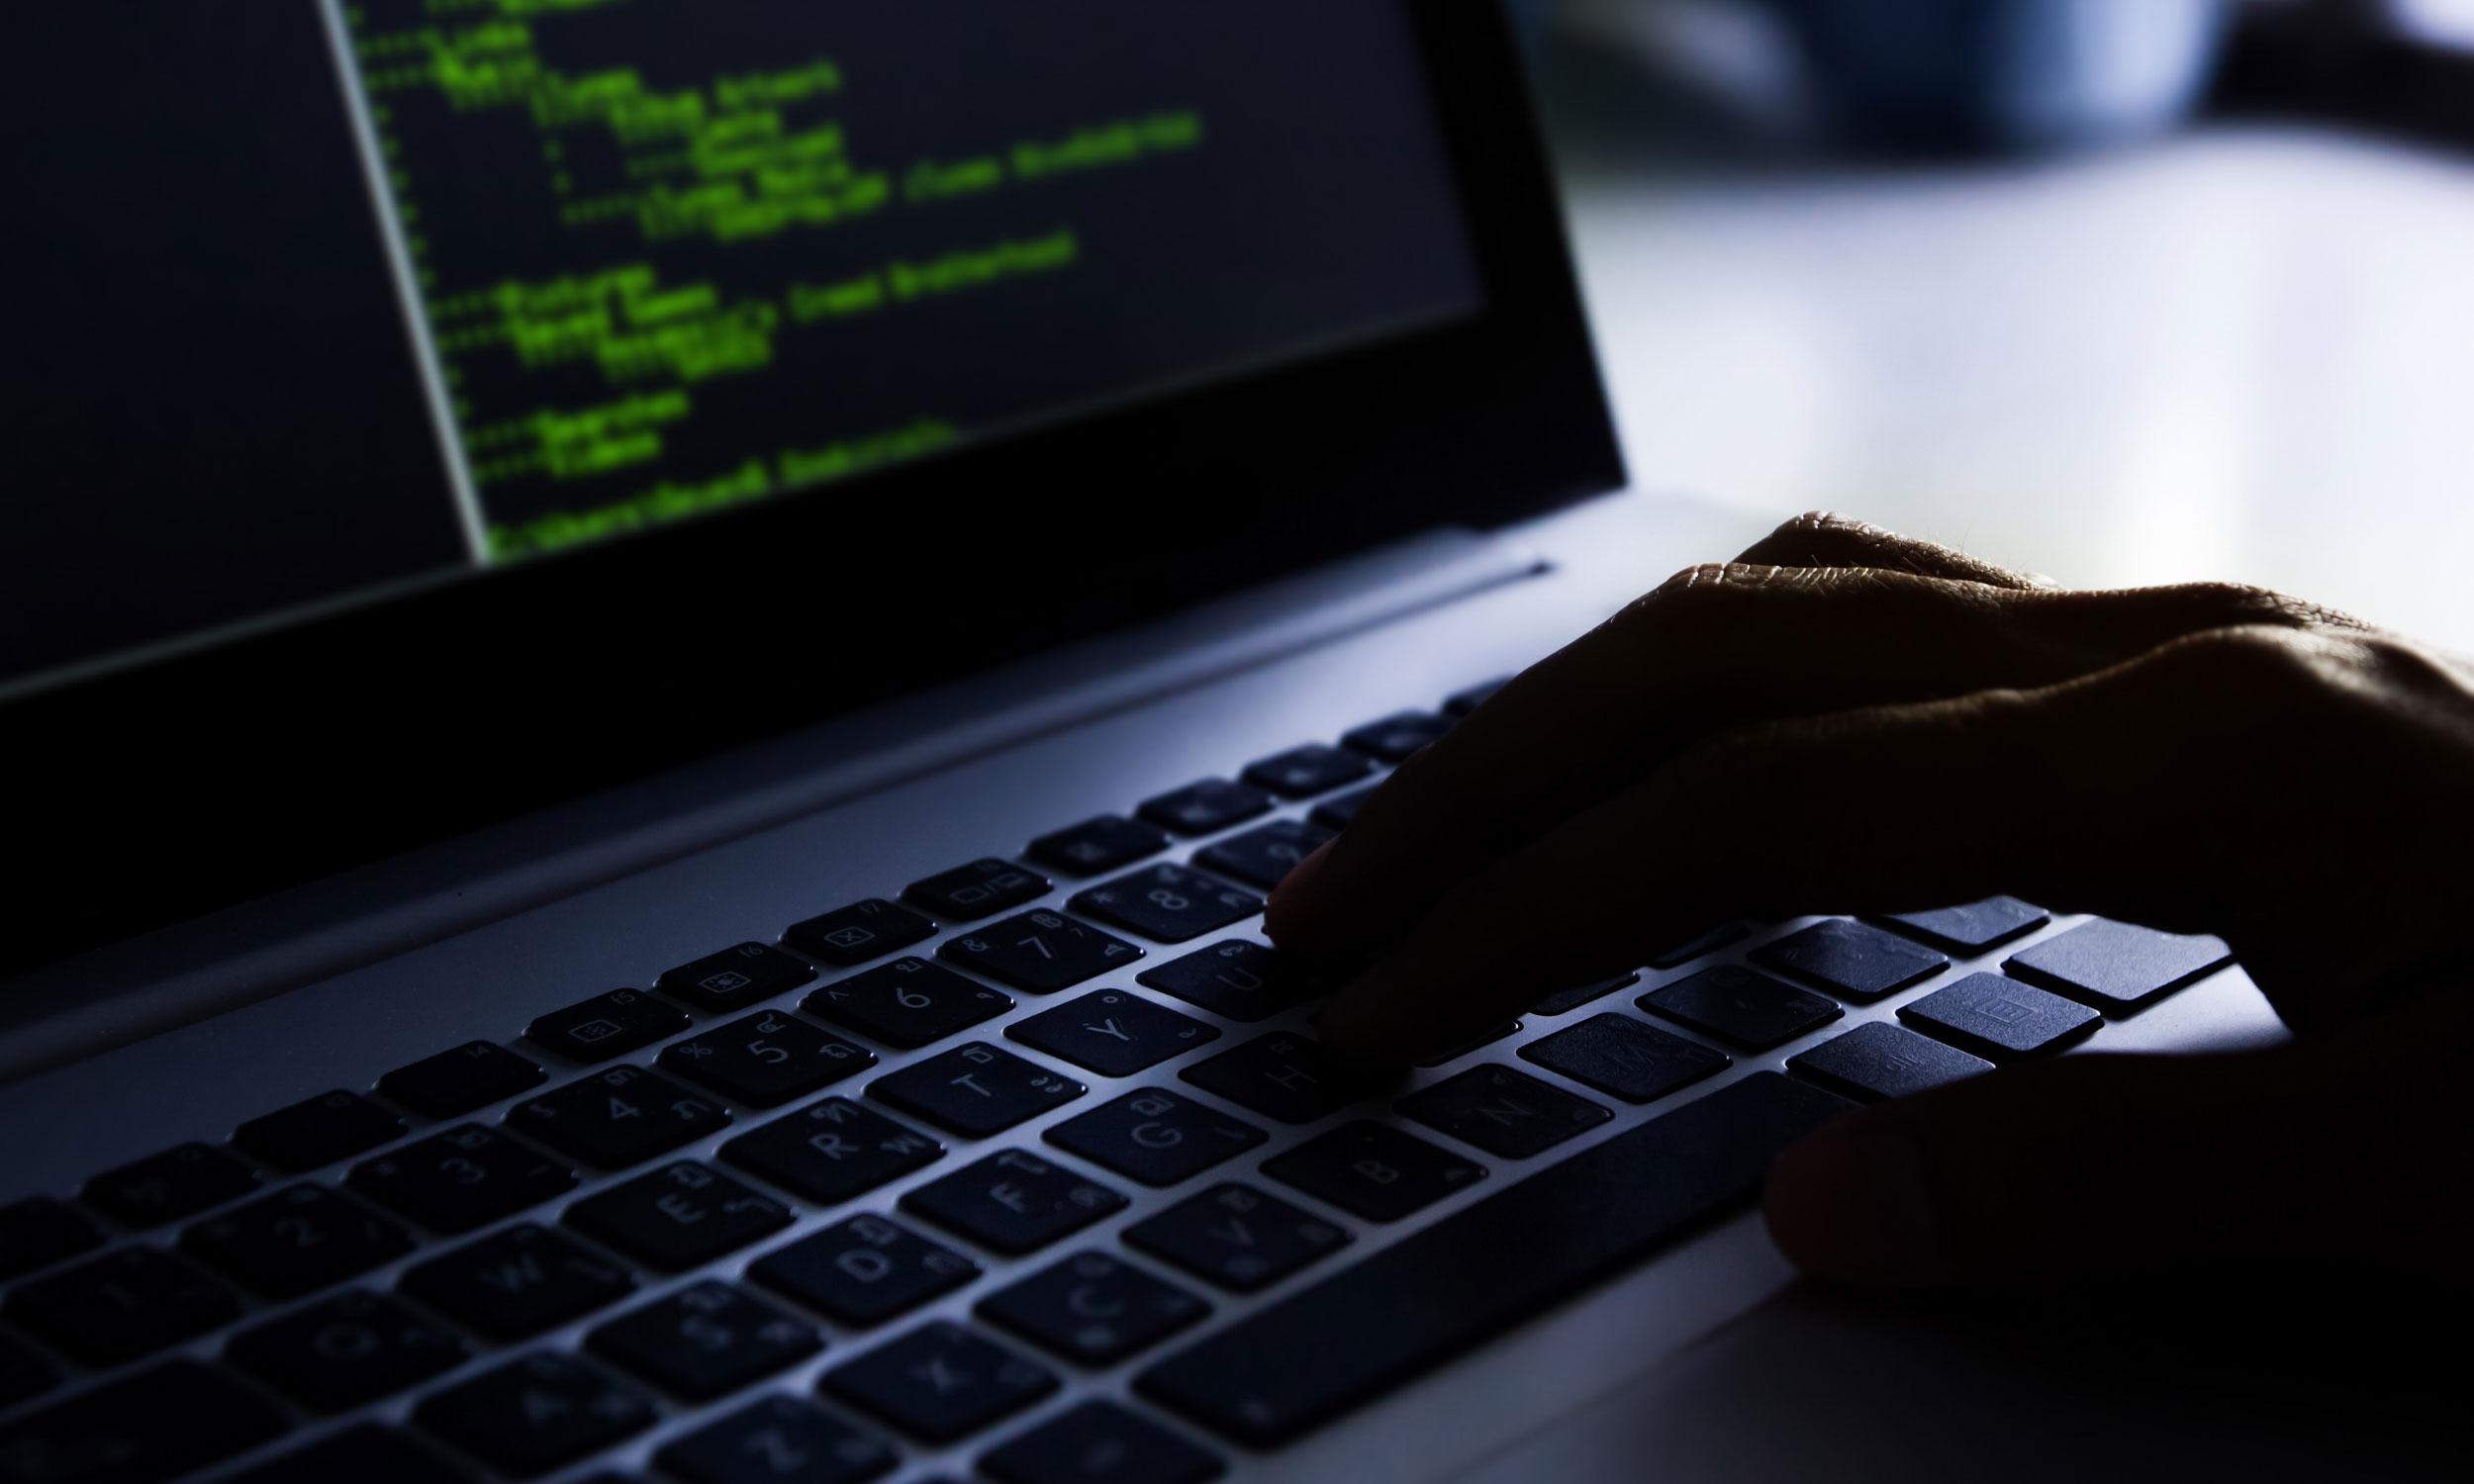 MSc cybercrime